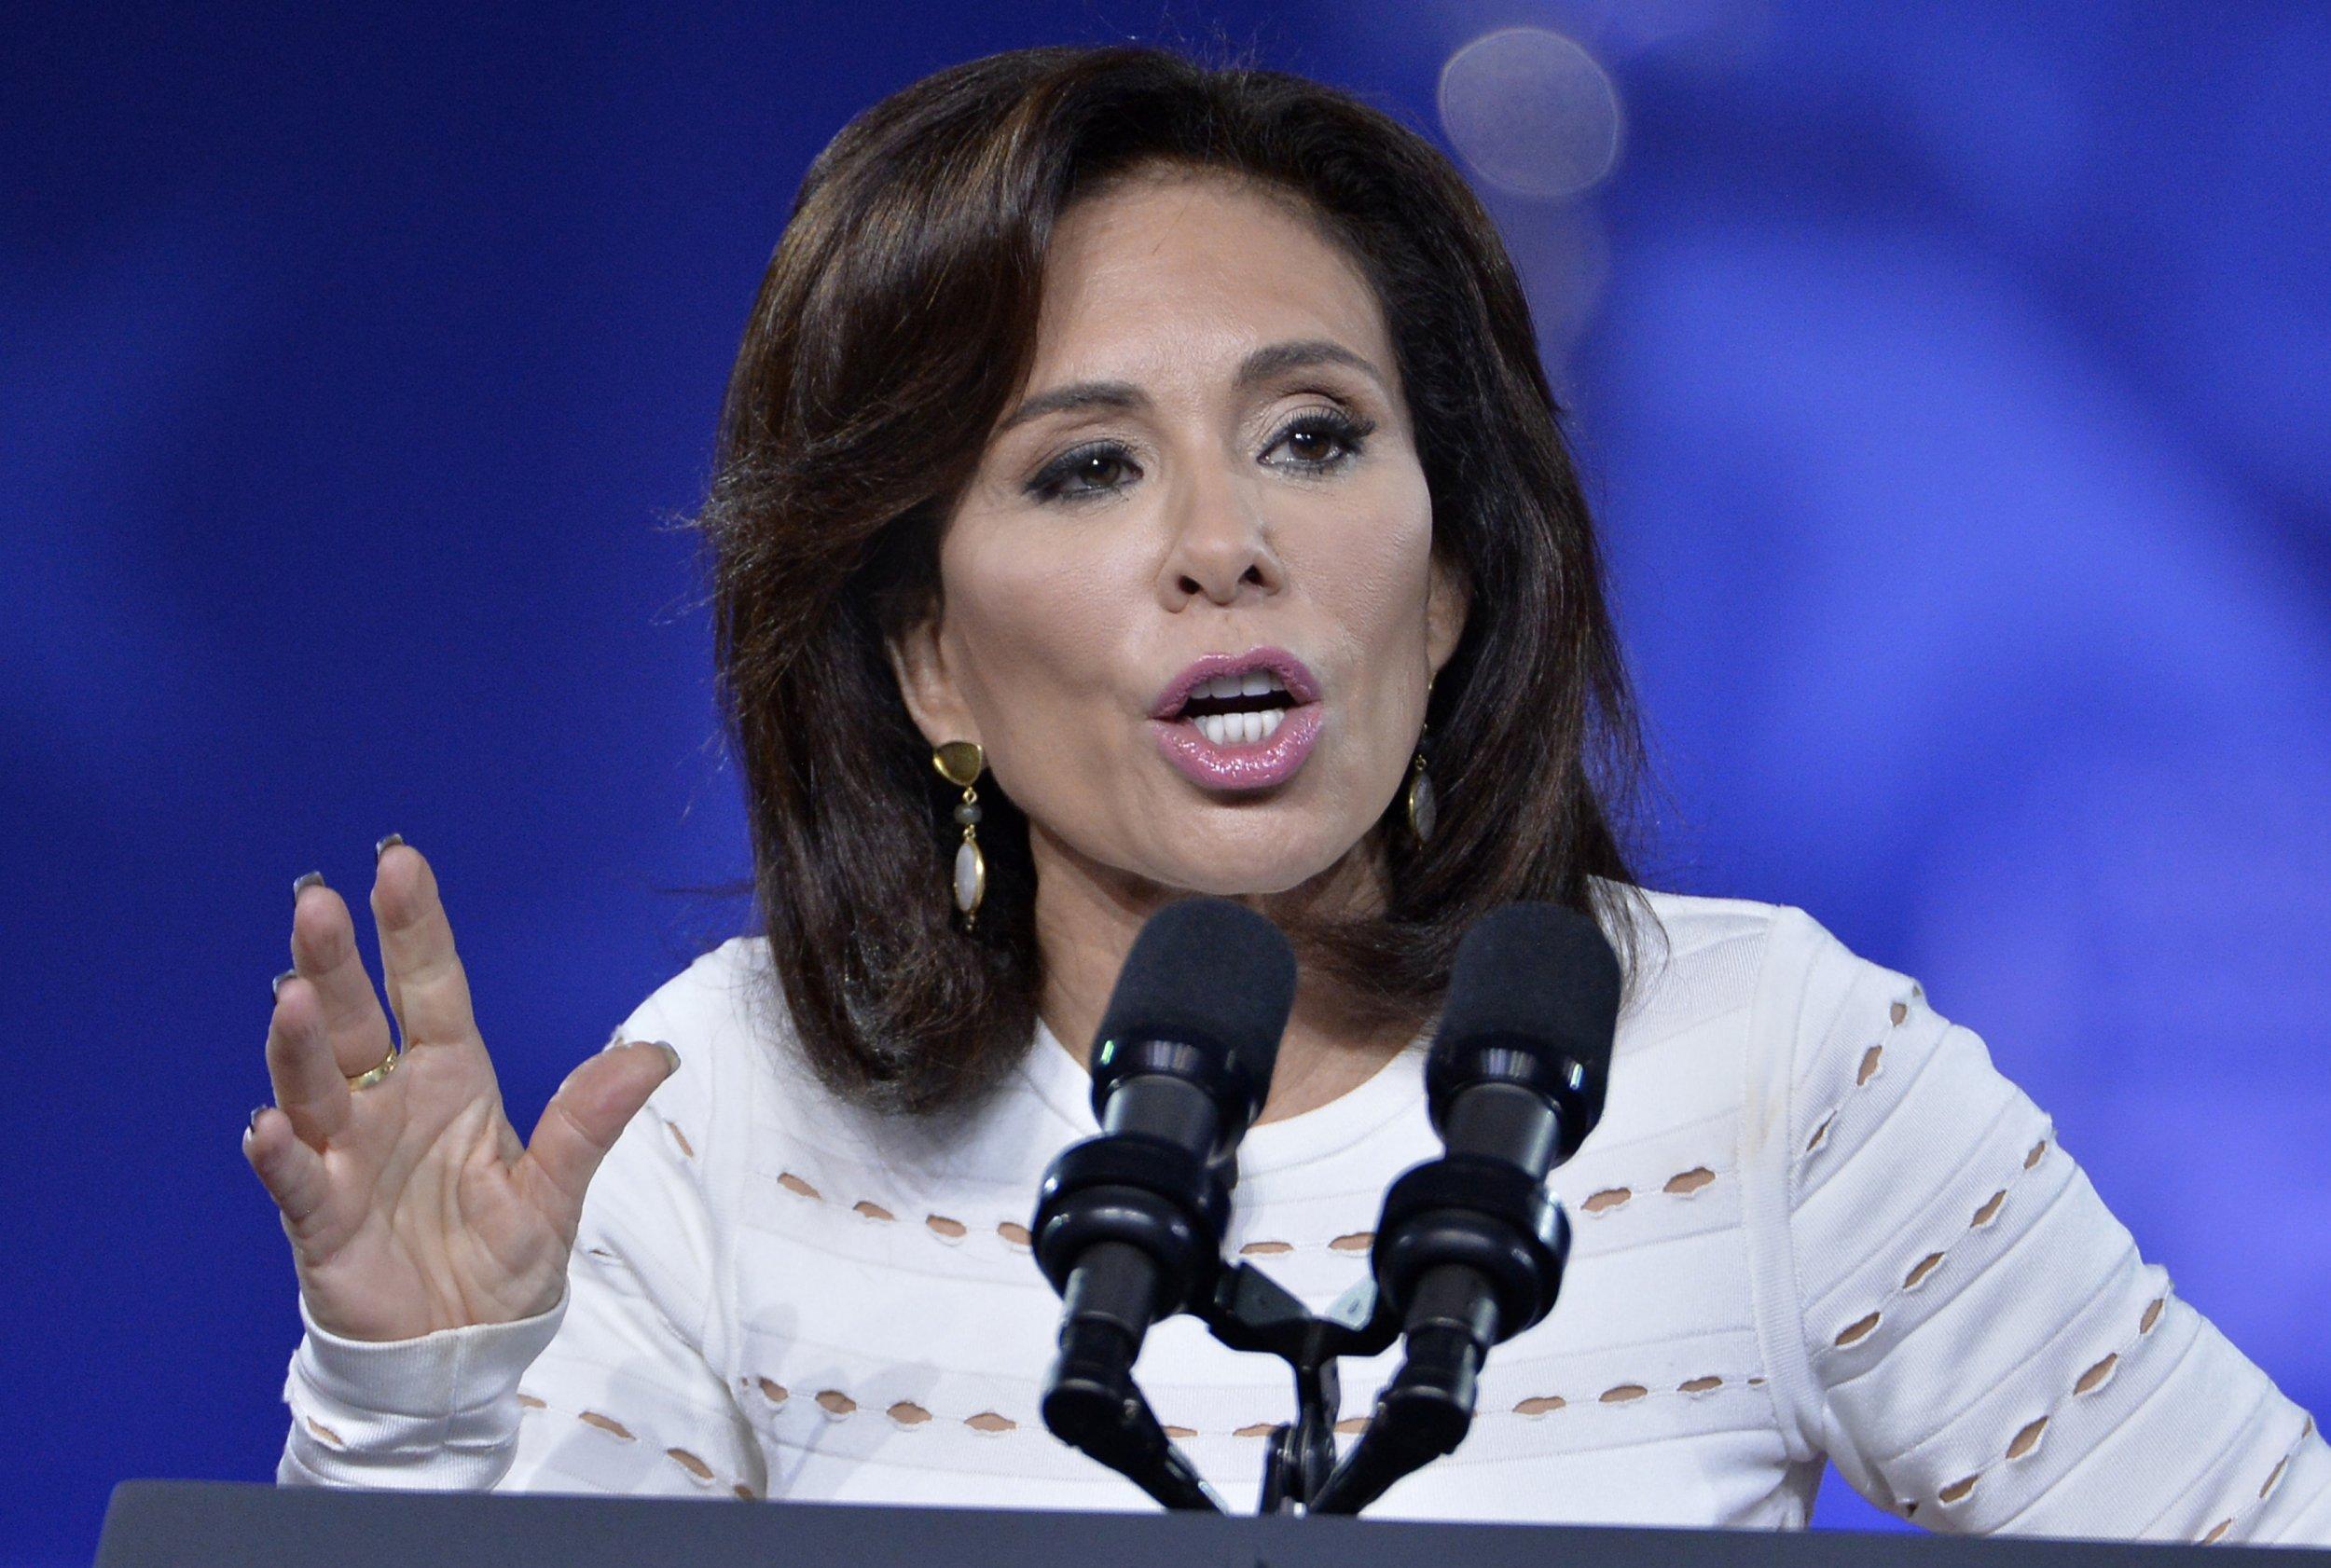 Fox News Host, Jeanine Pirro, Ilhan Omar, hijab, Sharia law